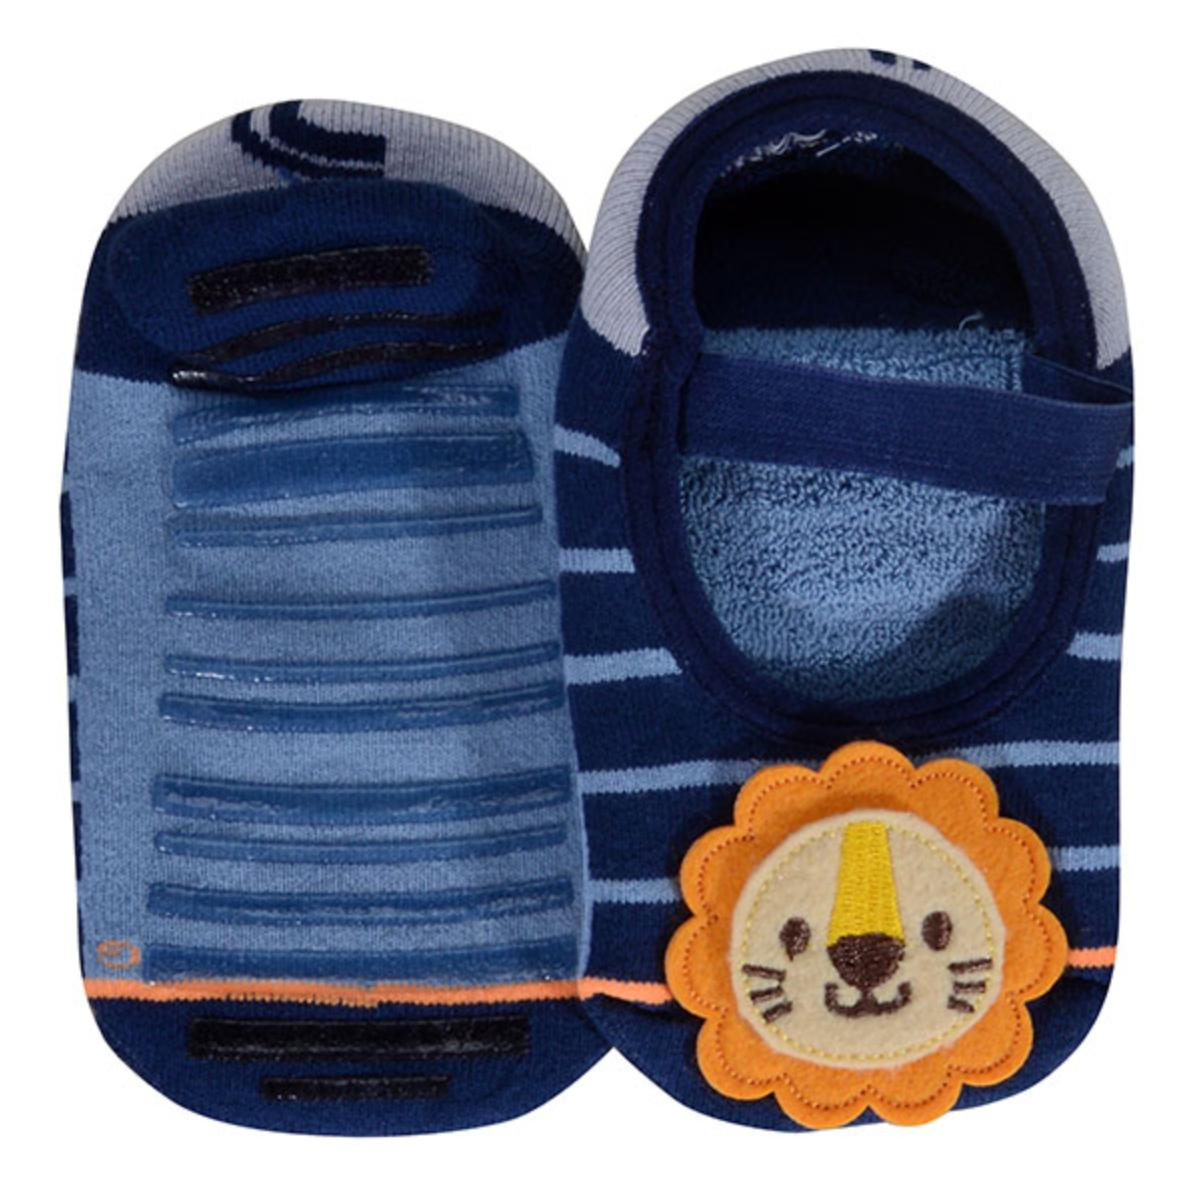 Meia Sapatilha Masc Infantil Lupo 11251 005 2560 Azul